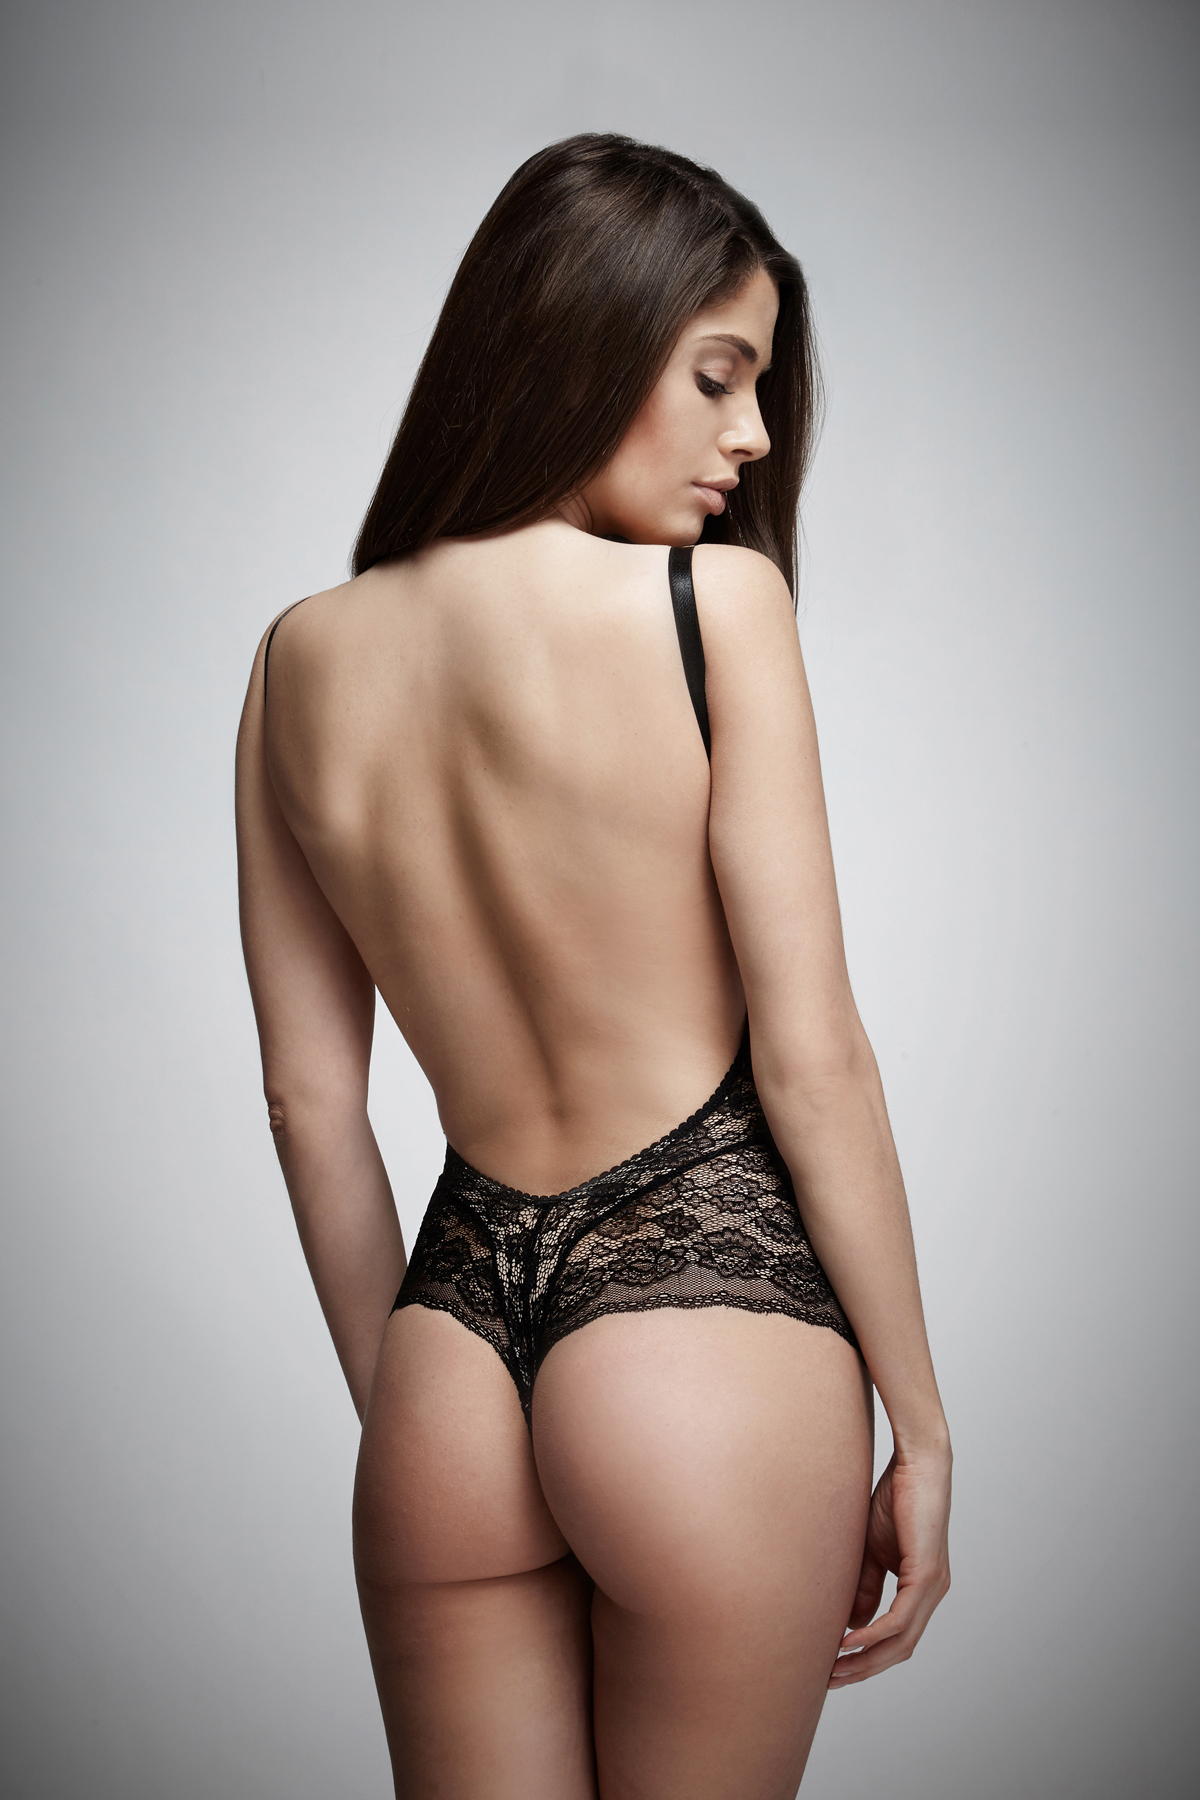 Gallery Panties Jemma Powell  nudes (22 fotos), 2019, butt